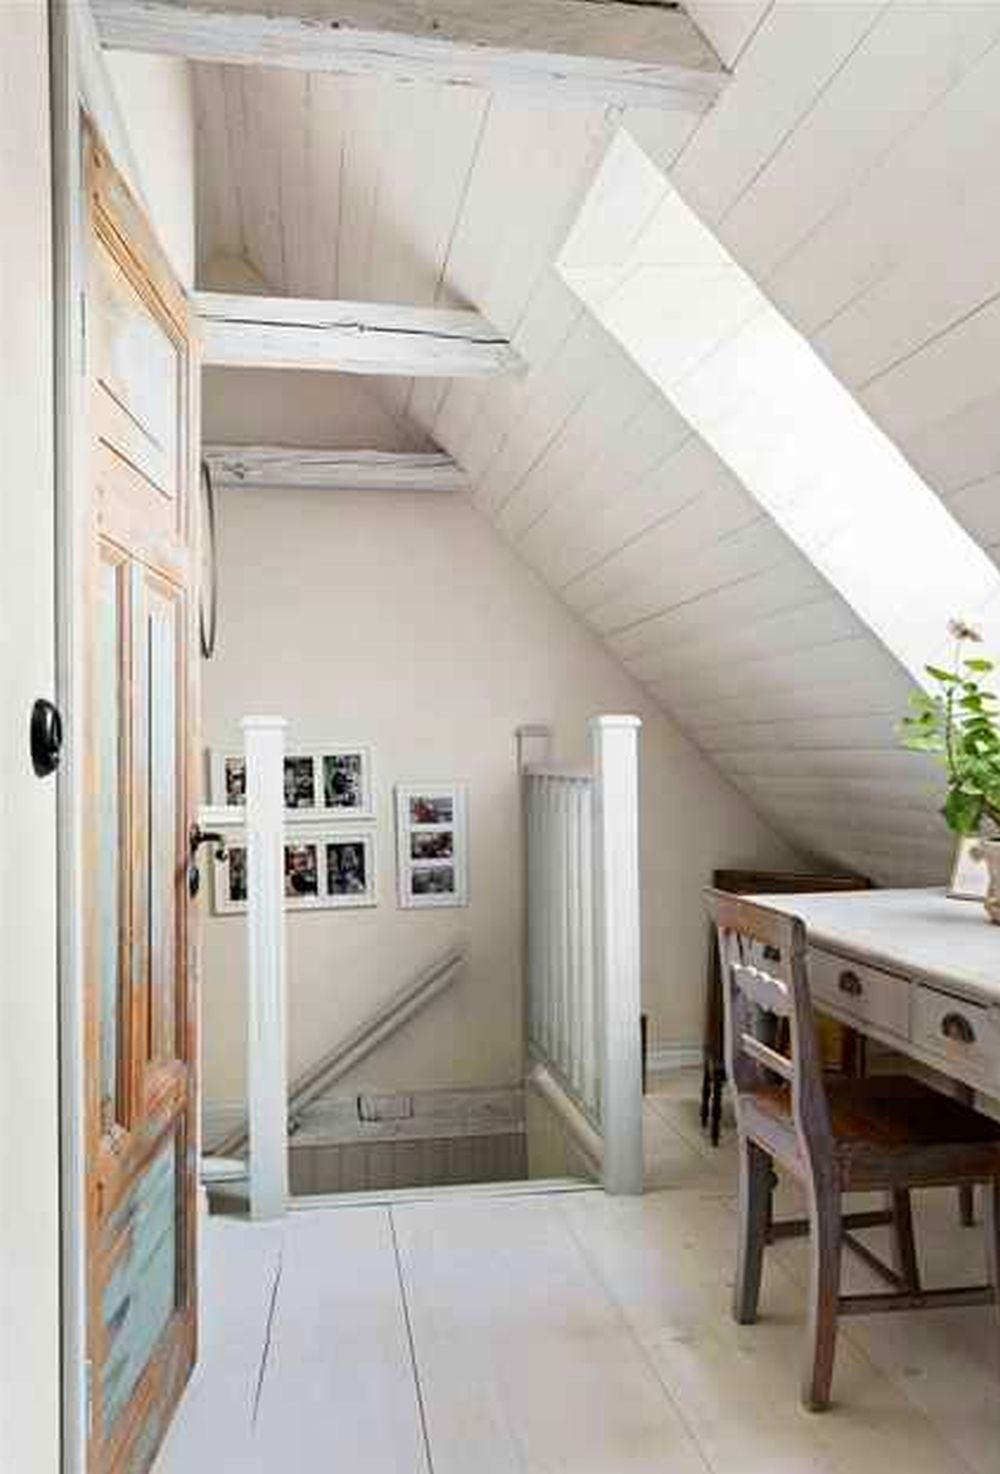 adelaparvu.com despre casa rustica Suedia, casa noua care pare veche, Foto Mats Svensson (3)